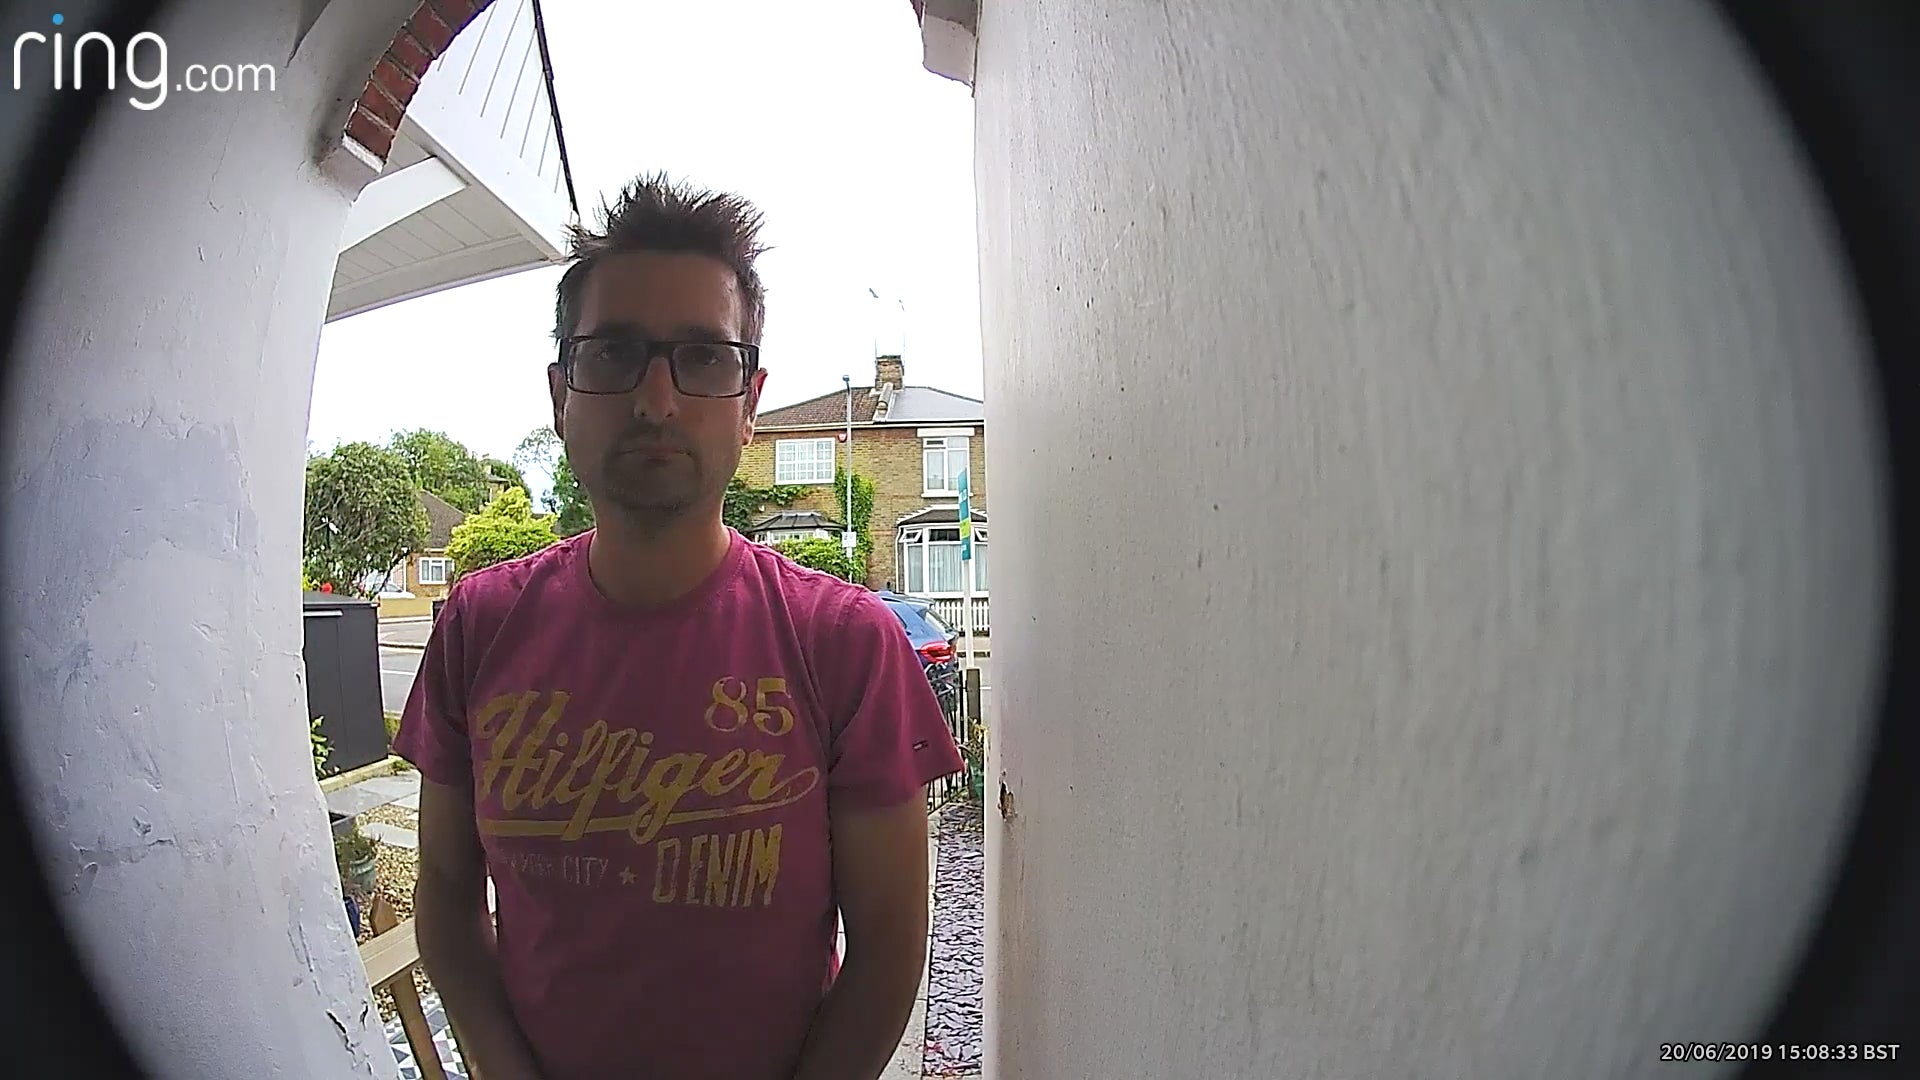 Ring Video Doorbell Pro Daytime Sample